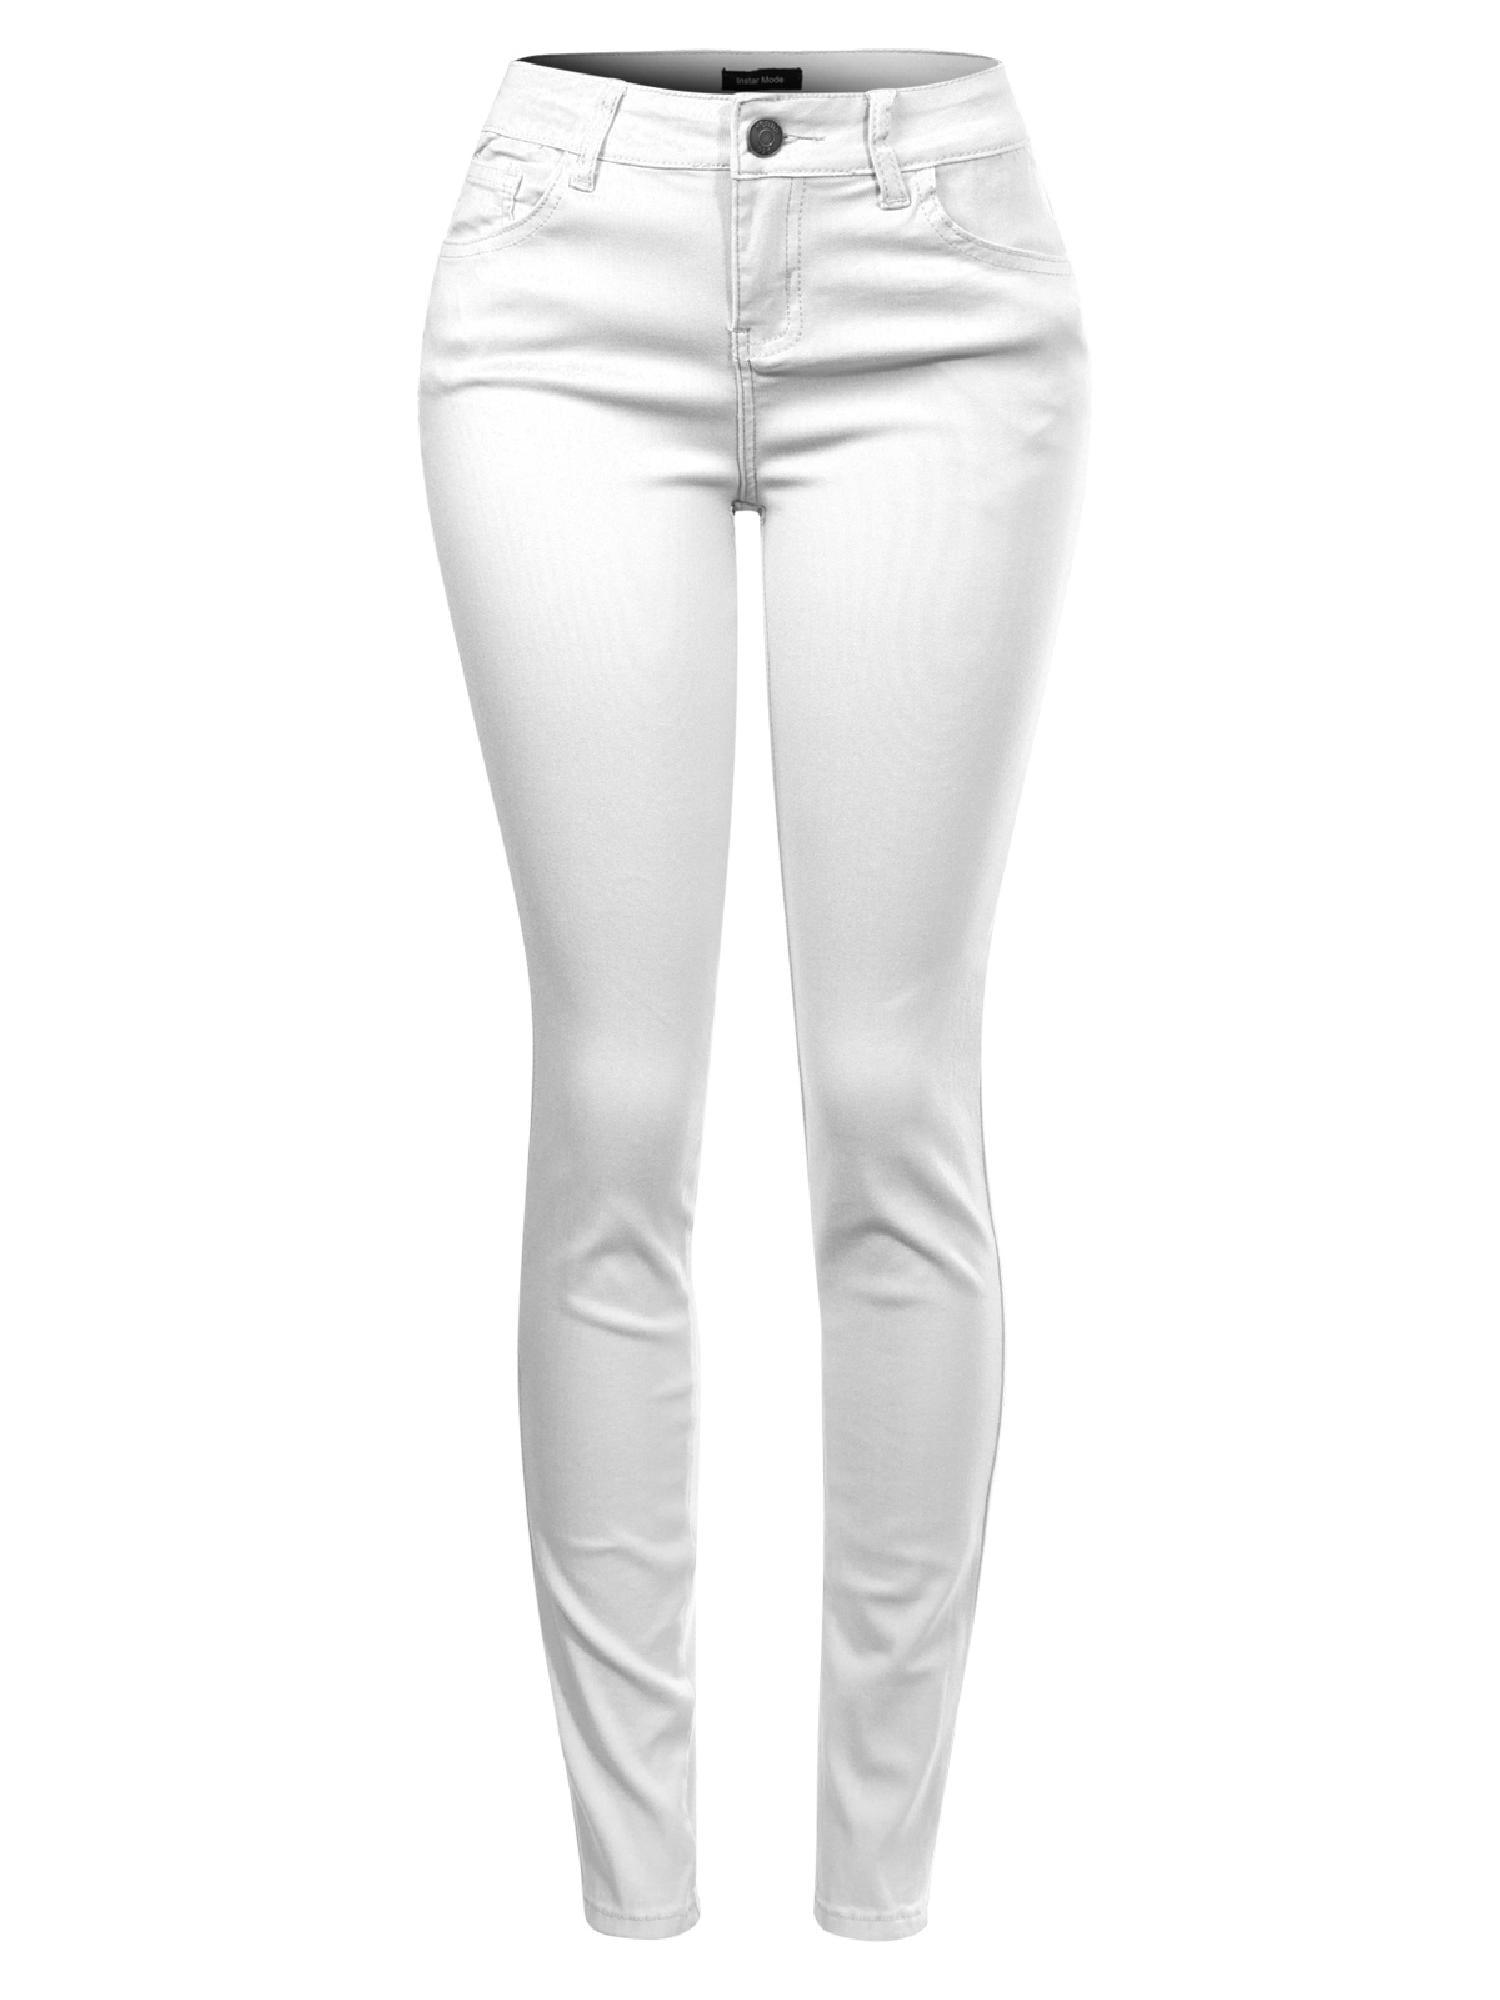 Made by Olivia Women's Butt Lift Super Comfy Stretch Denim Skinny Yoga Jeans Lightblue 11